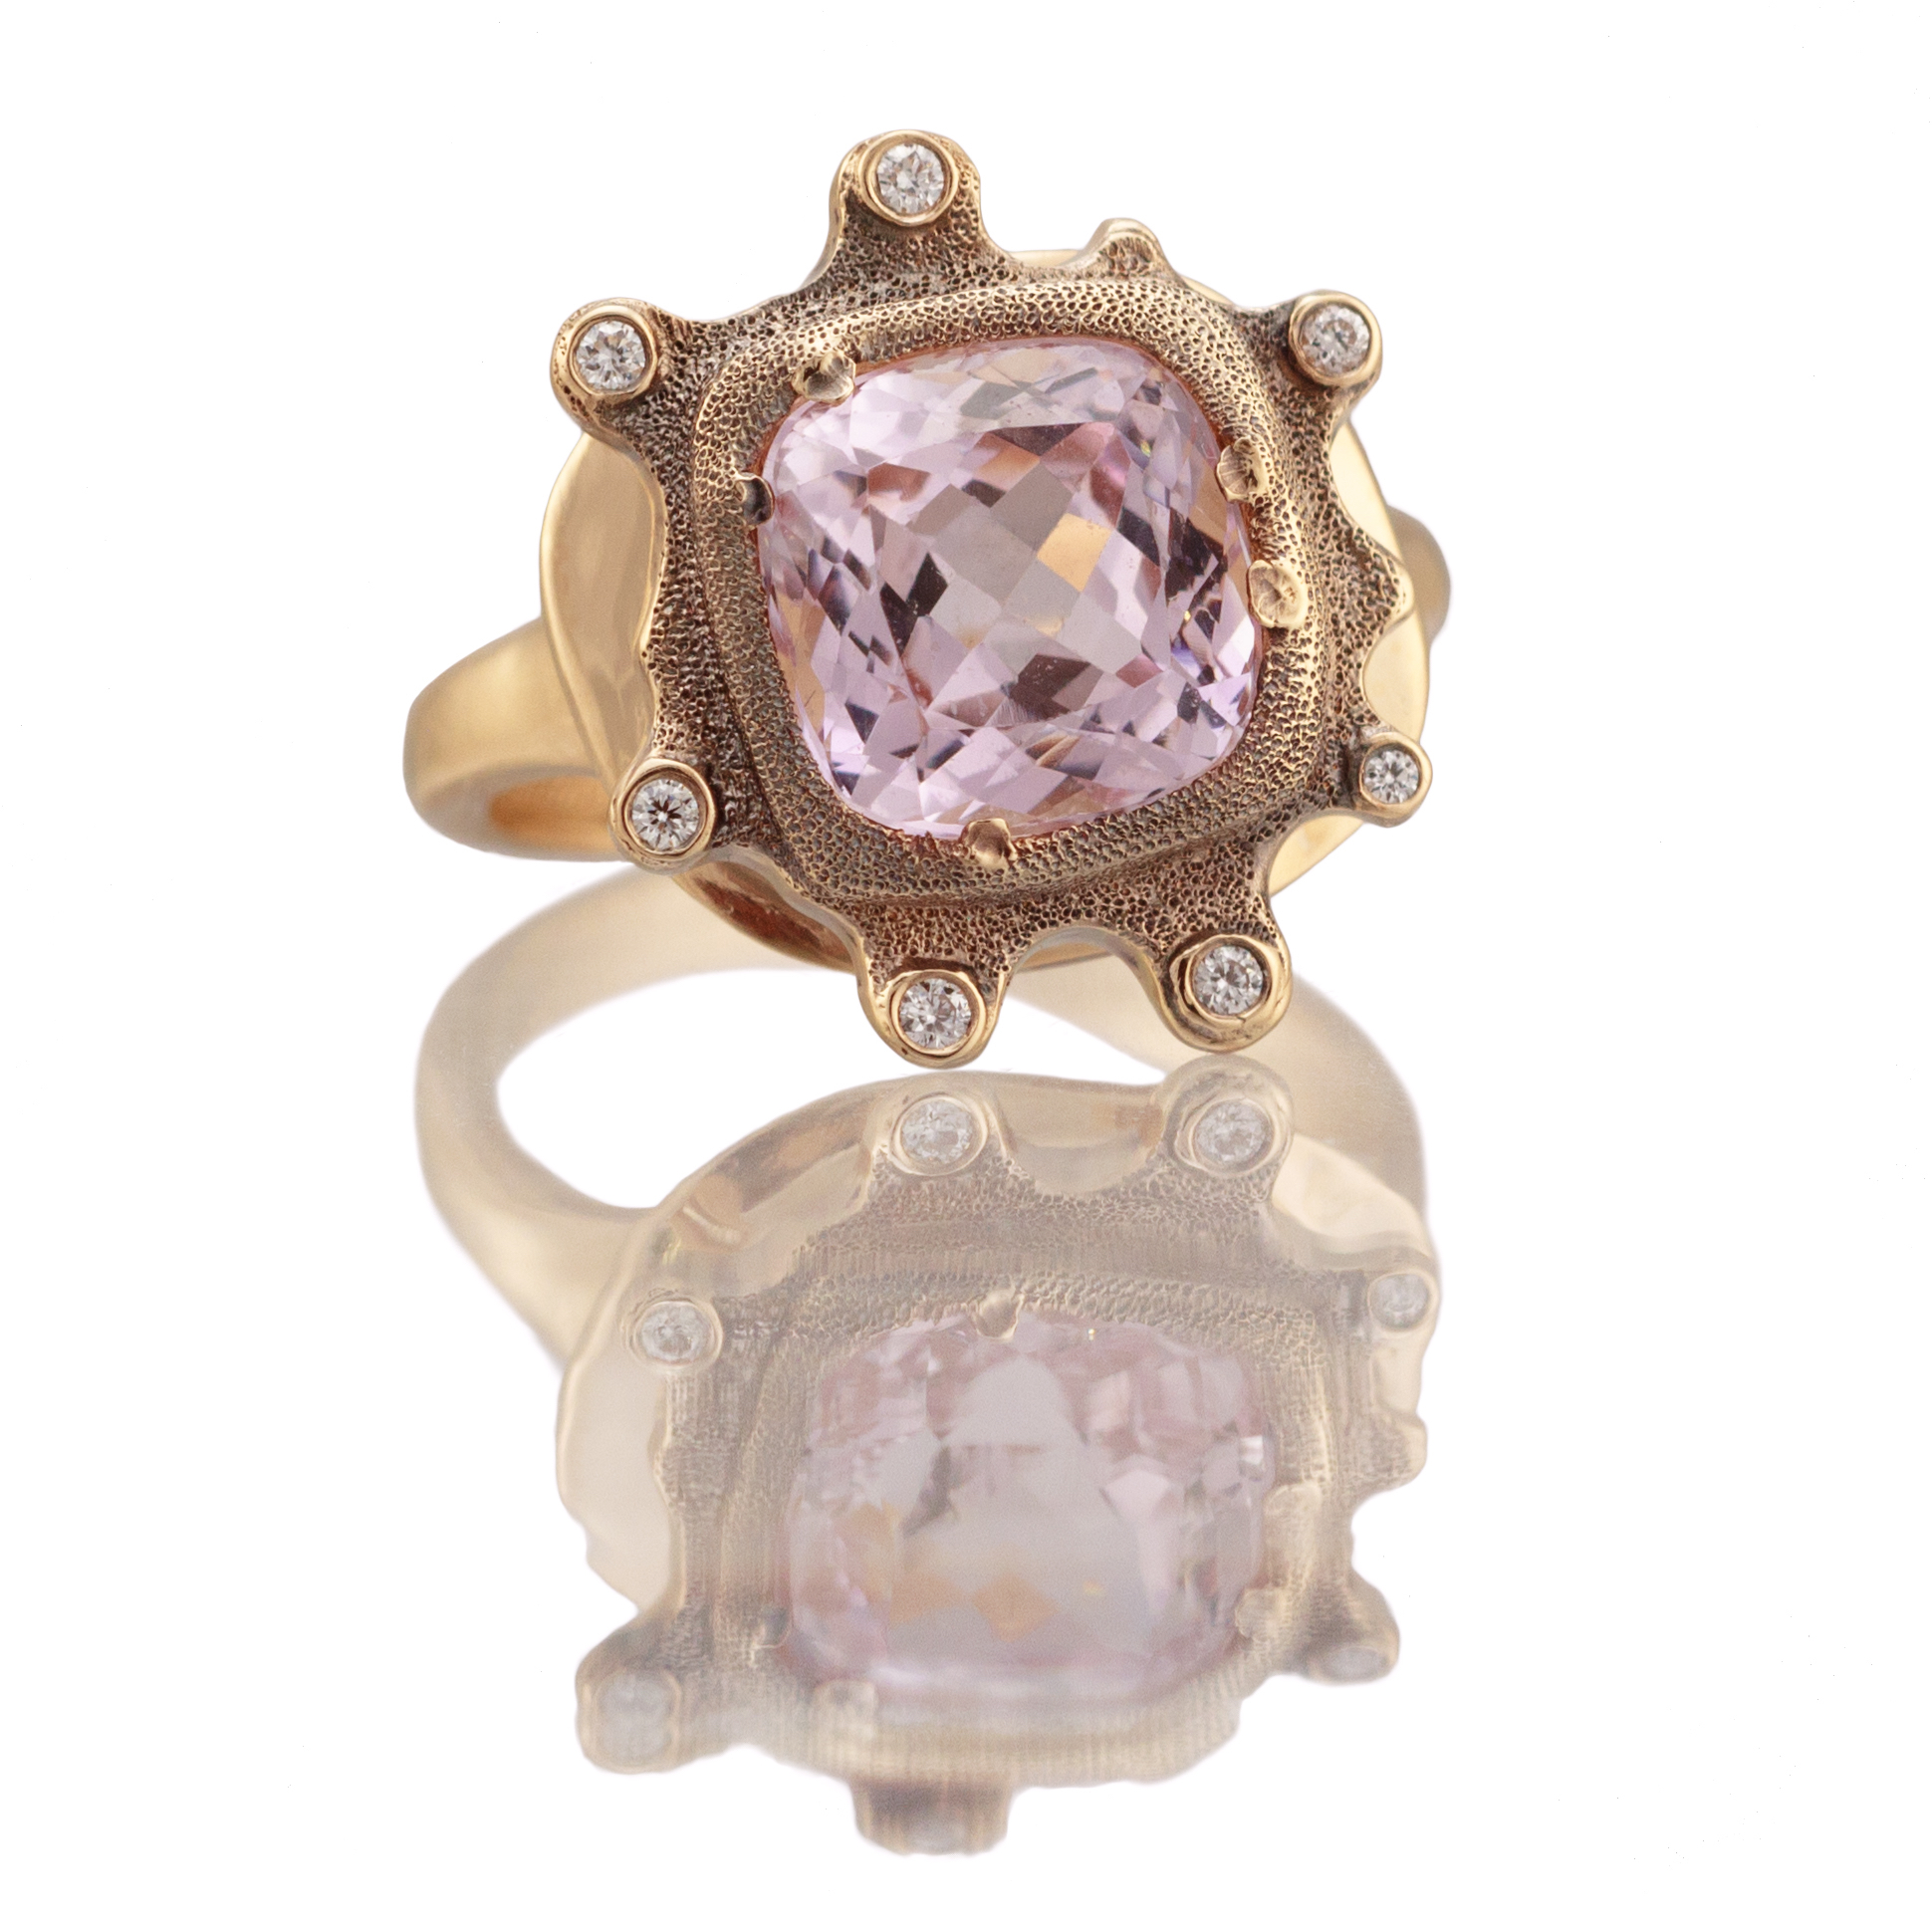 Petals. 4.39ct. Morganite, 18K yellow gold and white diamond ring.jpg